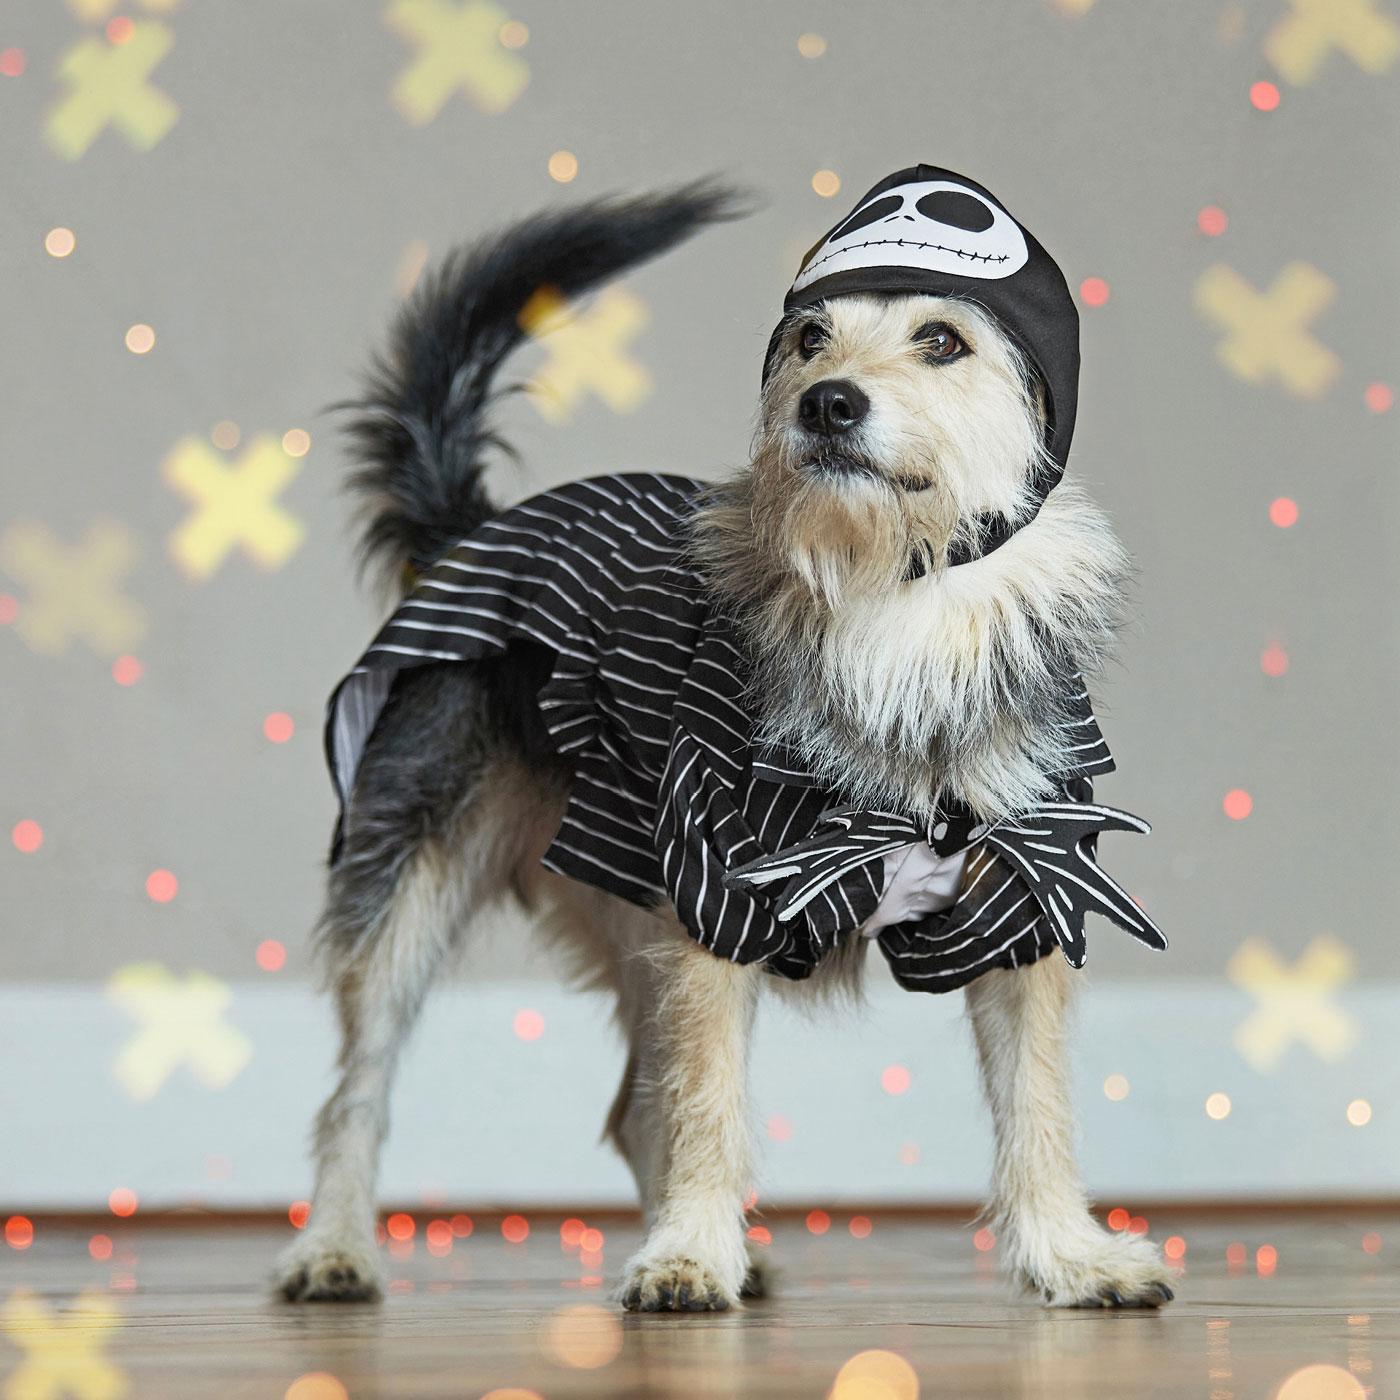 disney dog costumes - jack skellington from nightmare before christmas